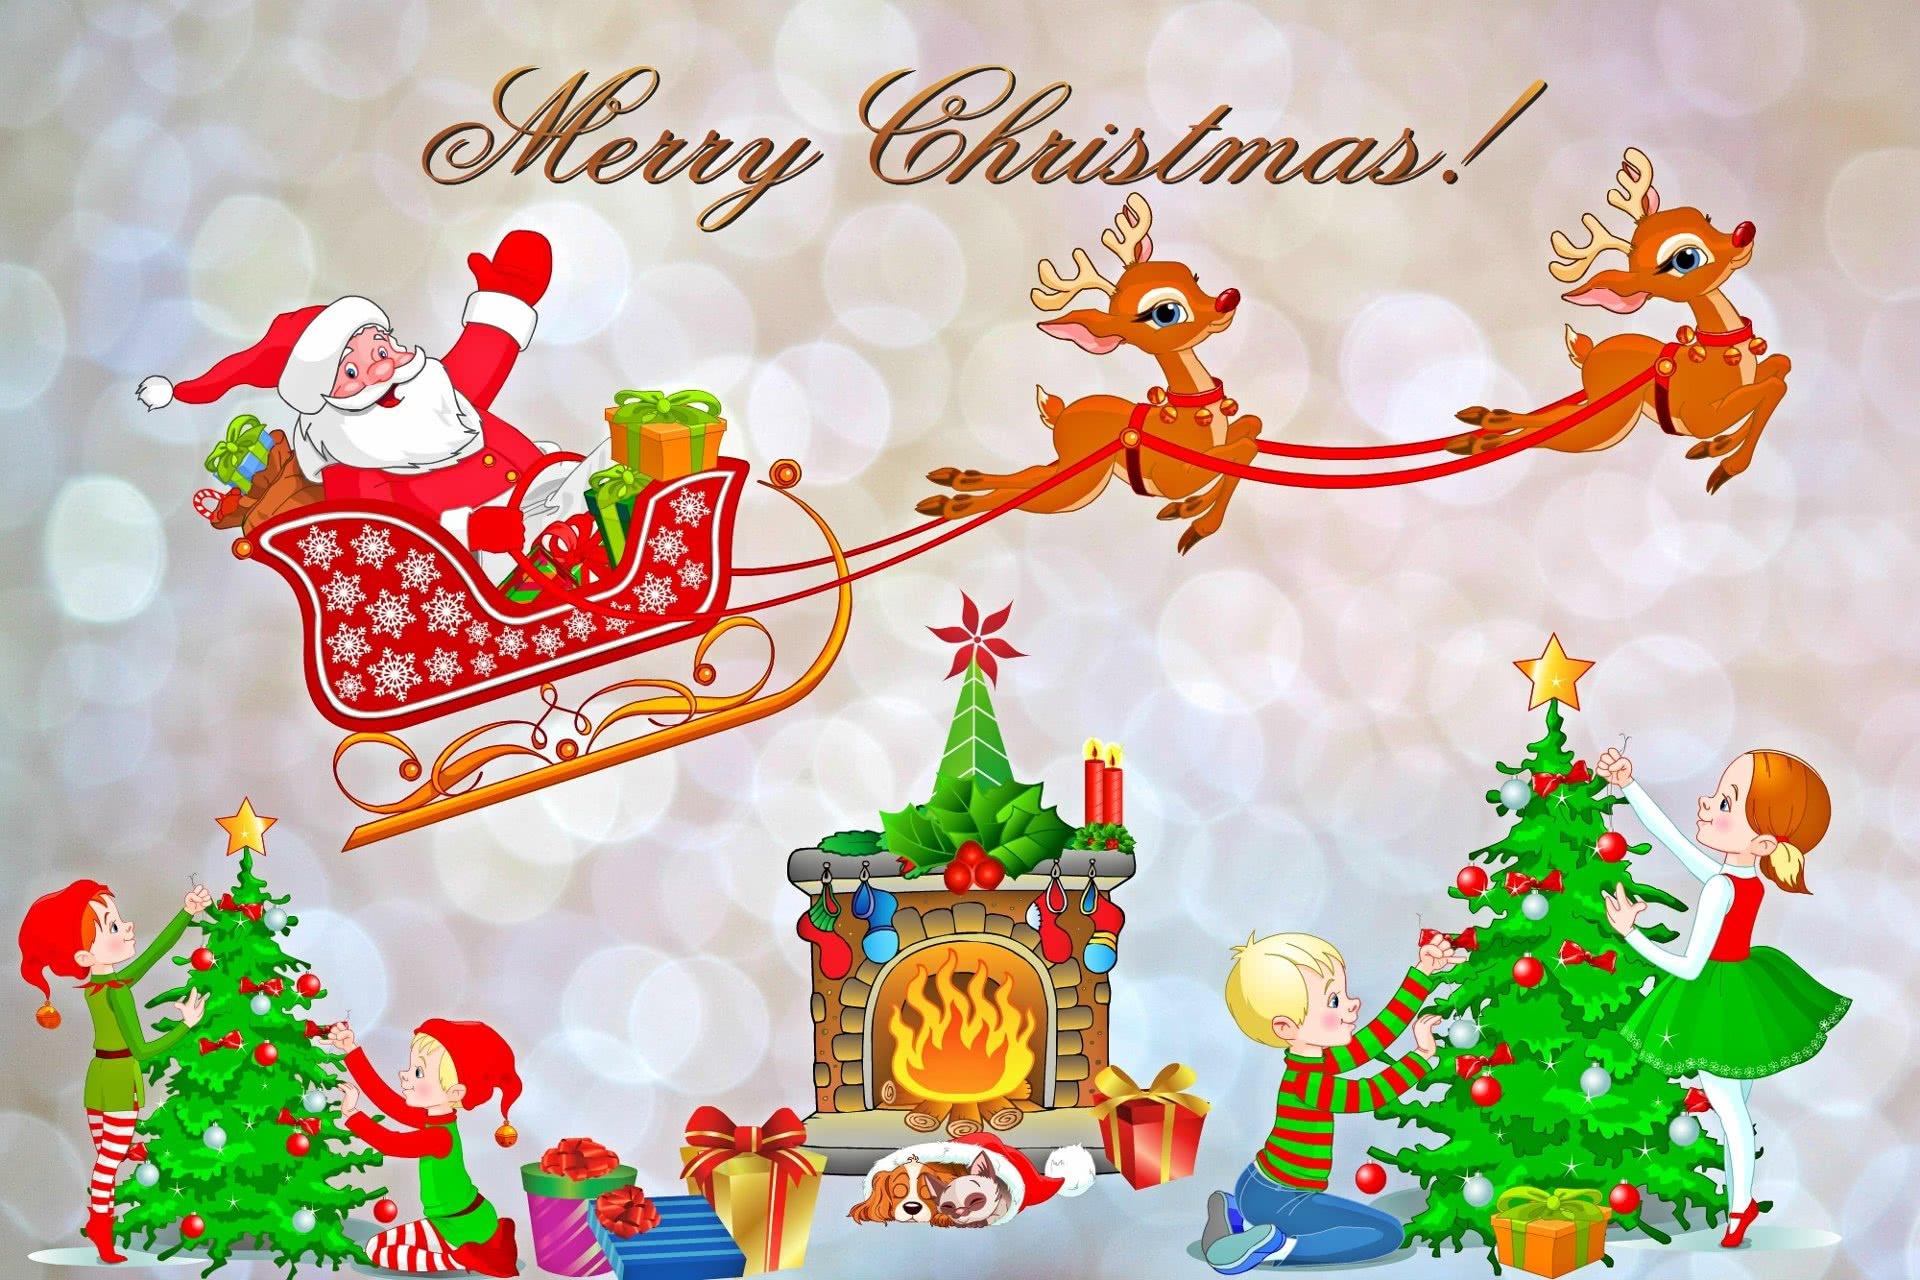 Wallpaper clipart for christmas transparent download Christmas clipart wallpaper - /holiday/Christmas/wallpaper ... transparent download